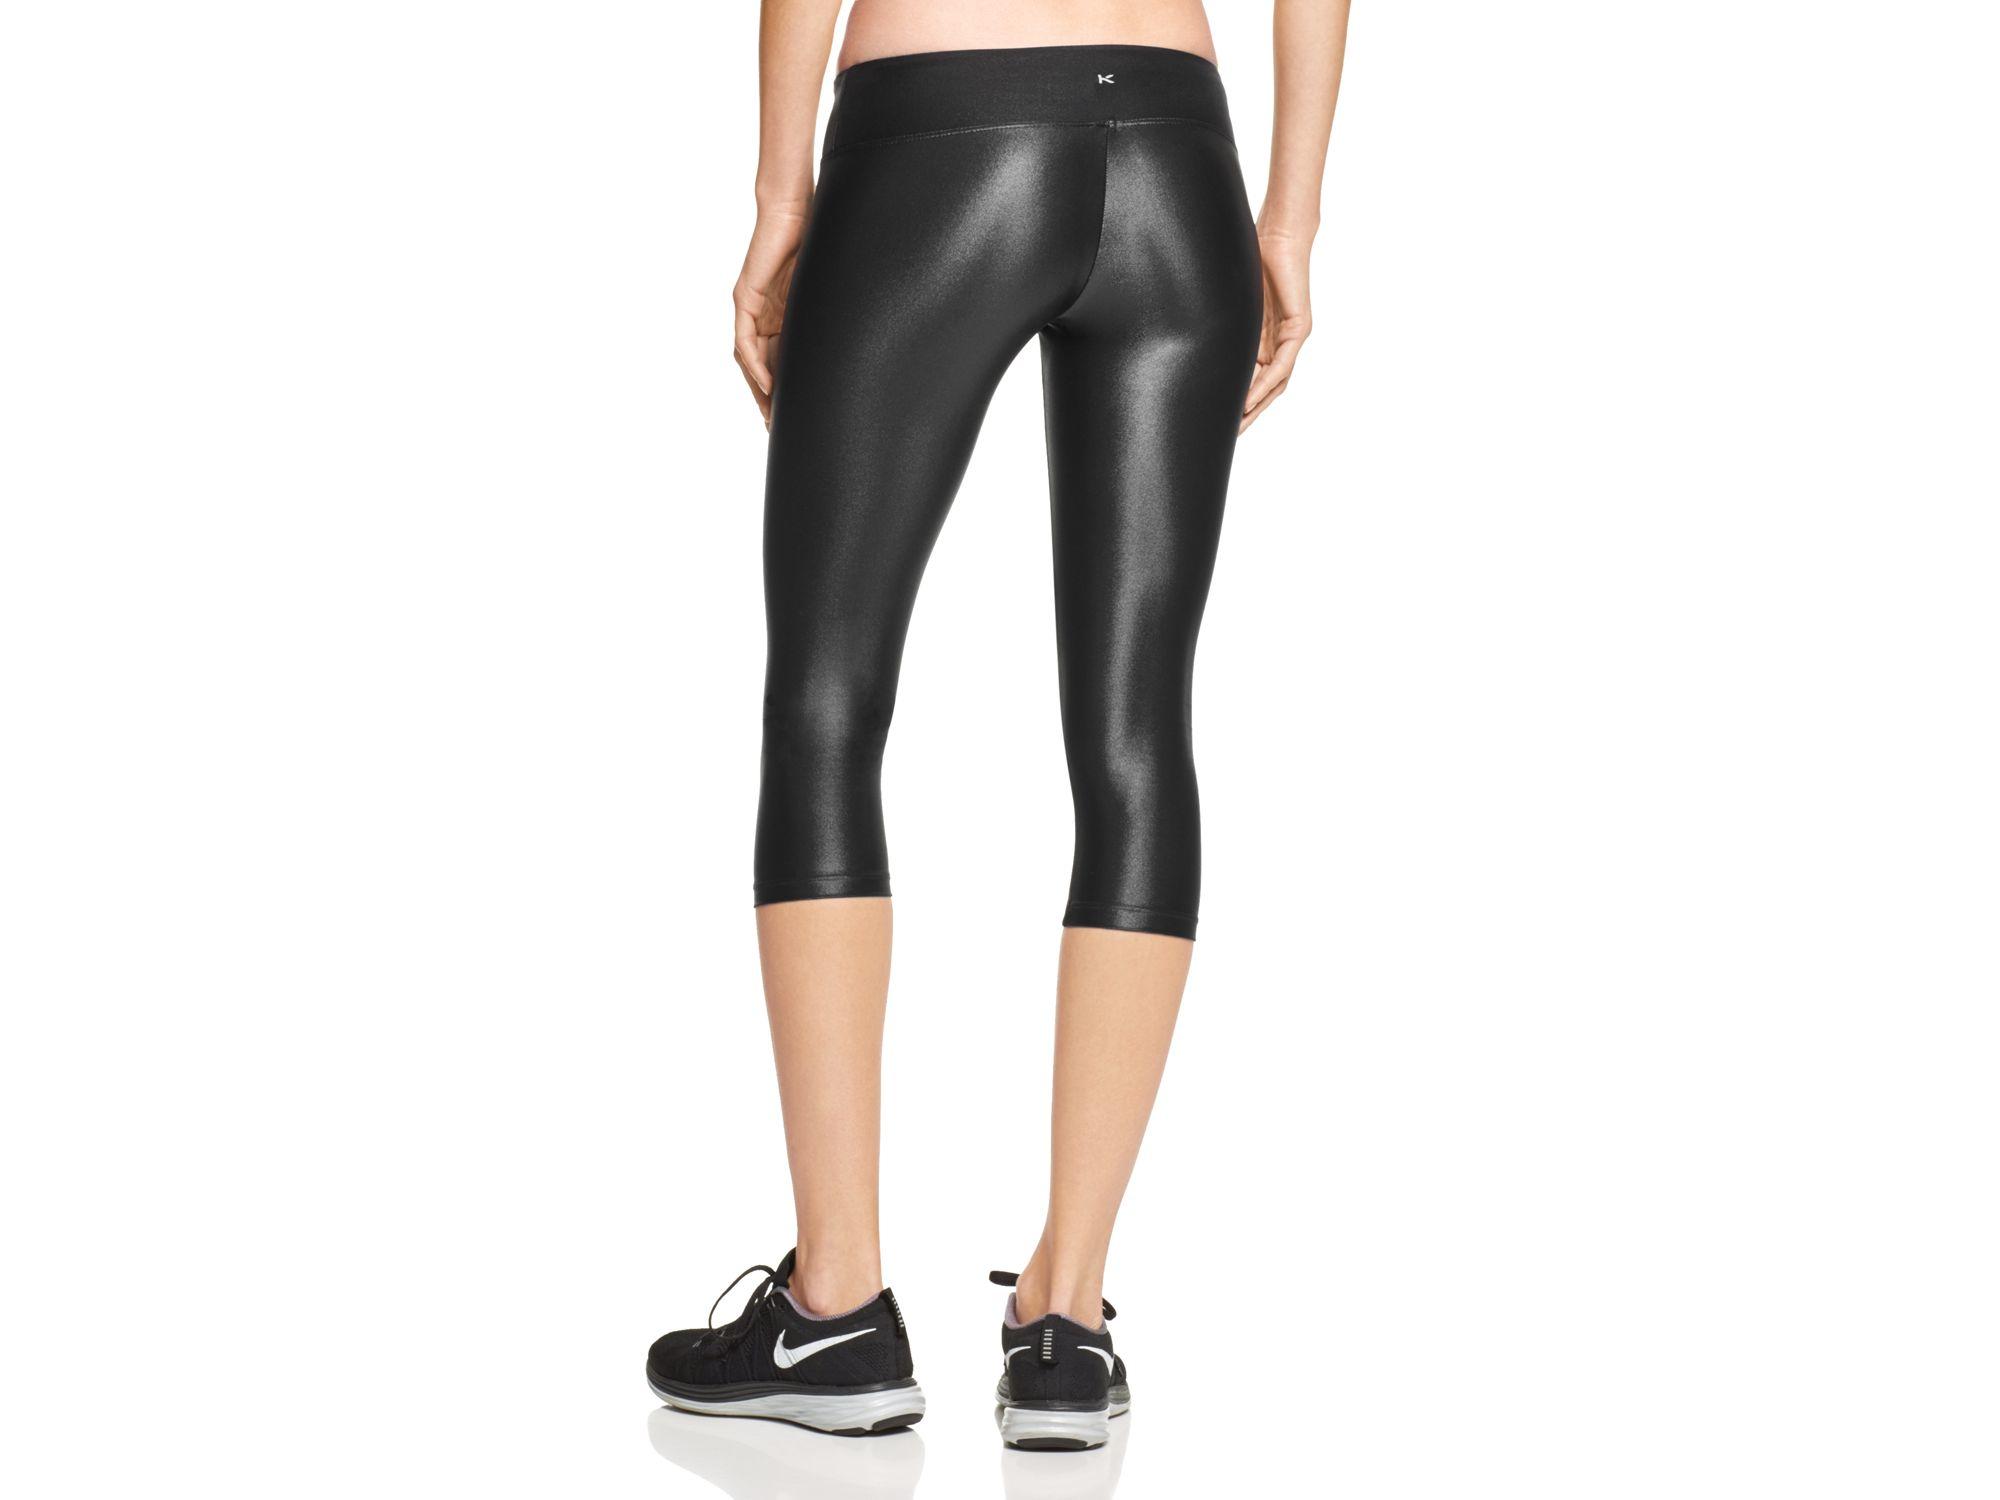 Koral Activewear Lustrous Capri Leggings in Black   Lyst